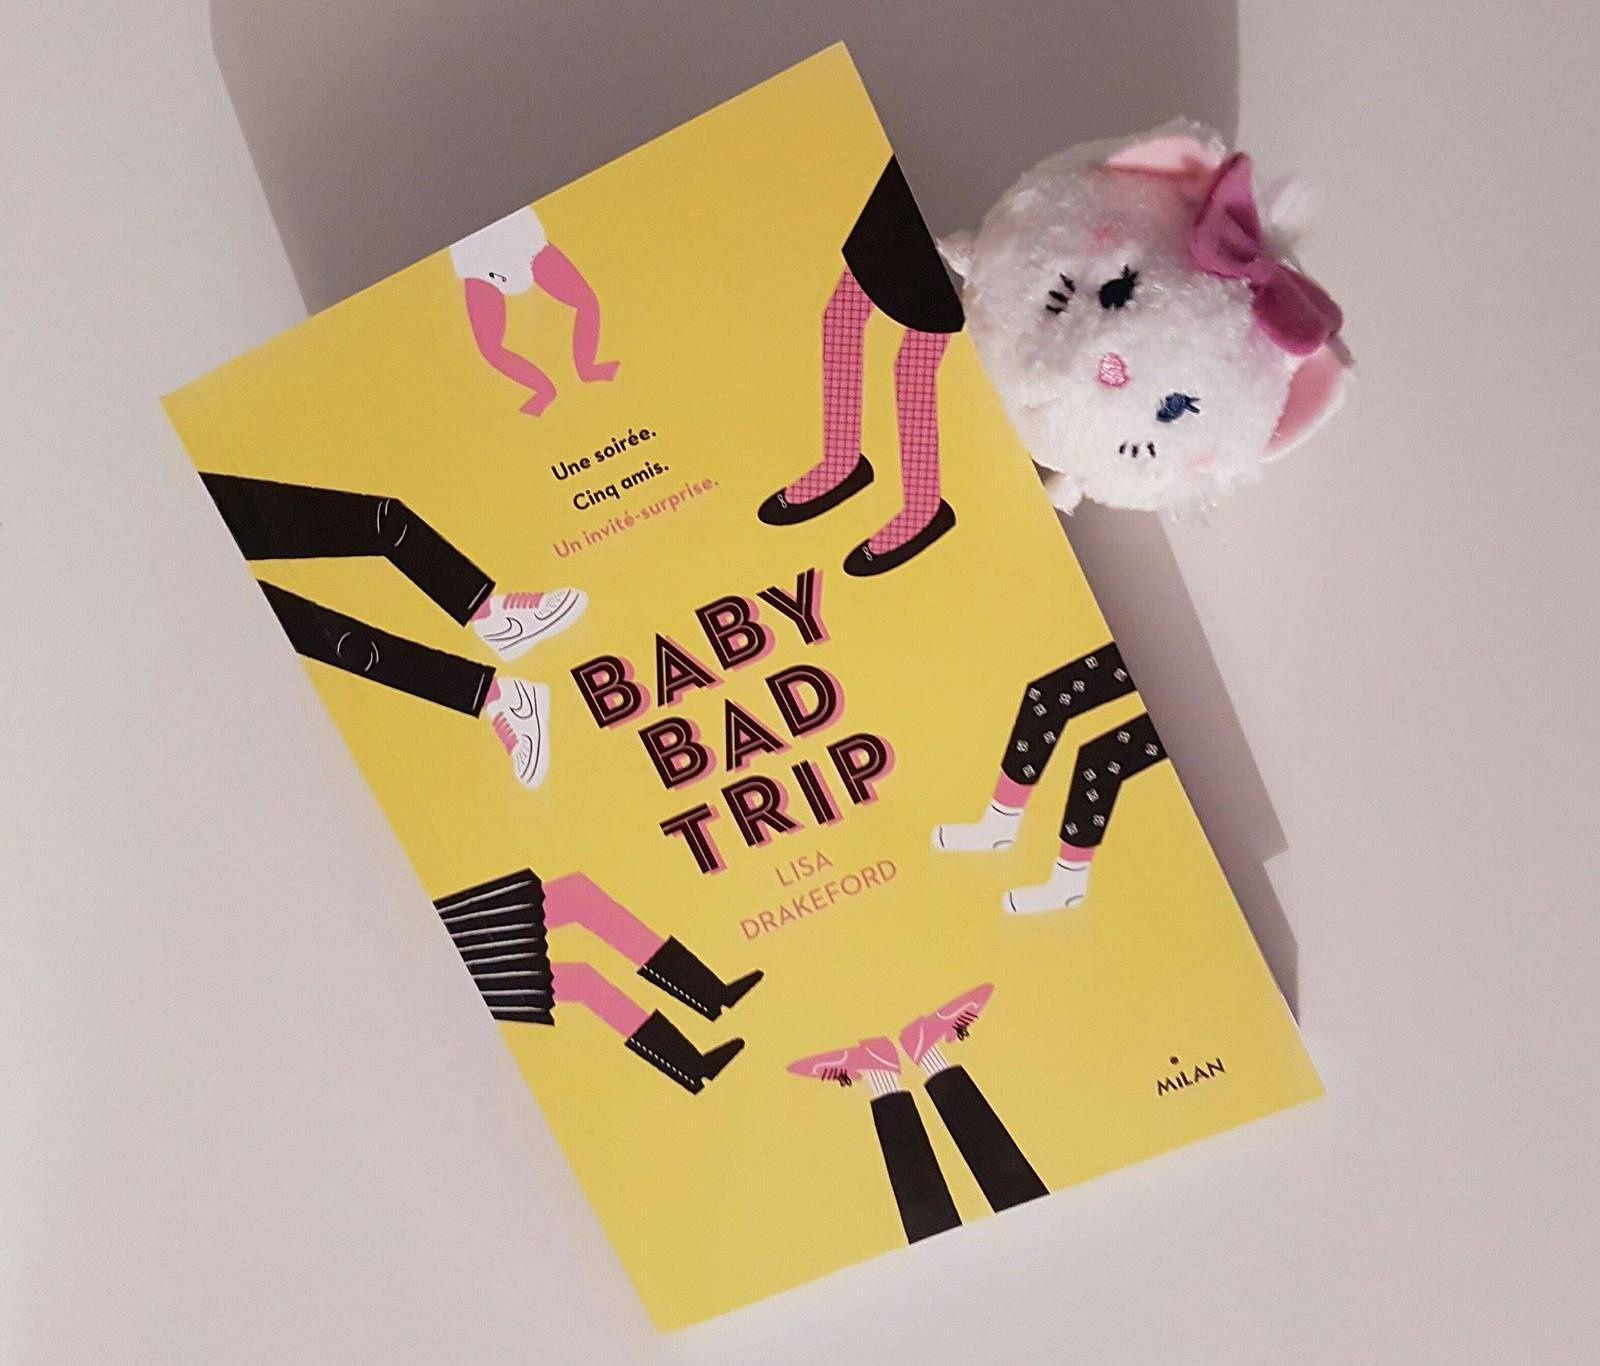 Baby bad trip - Lisa Drakeford